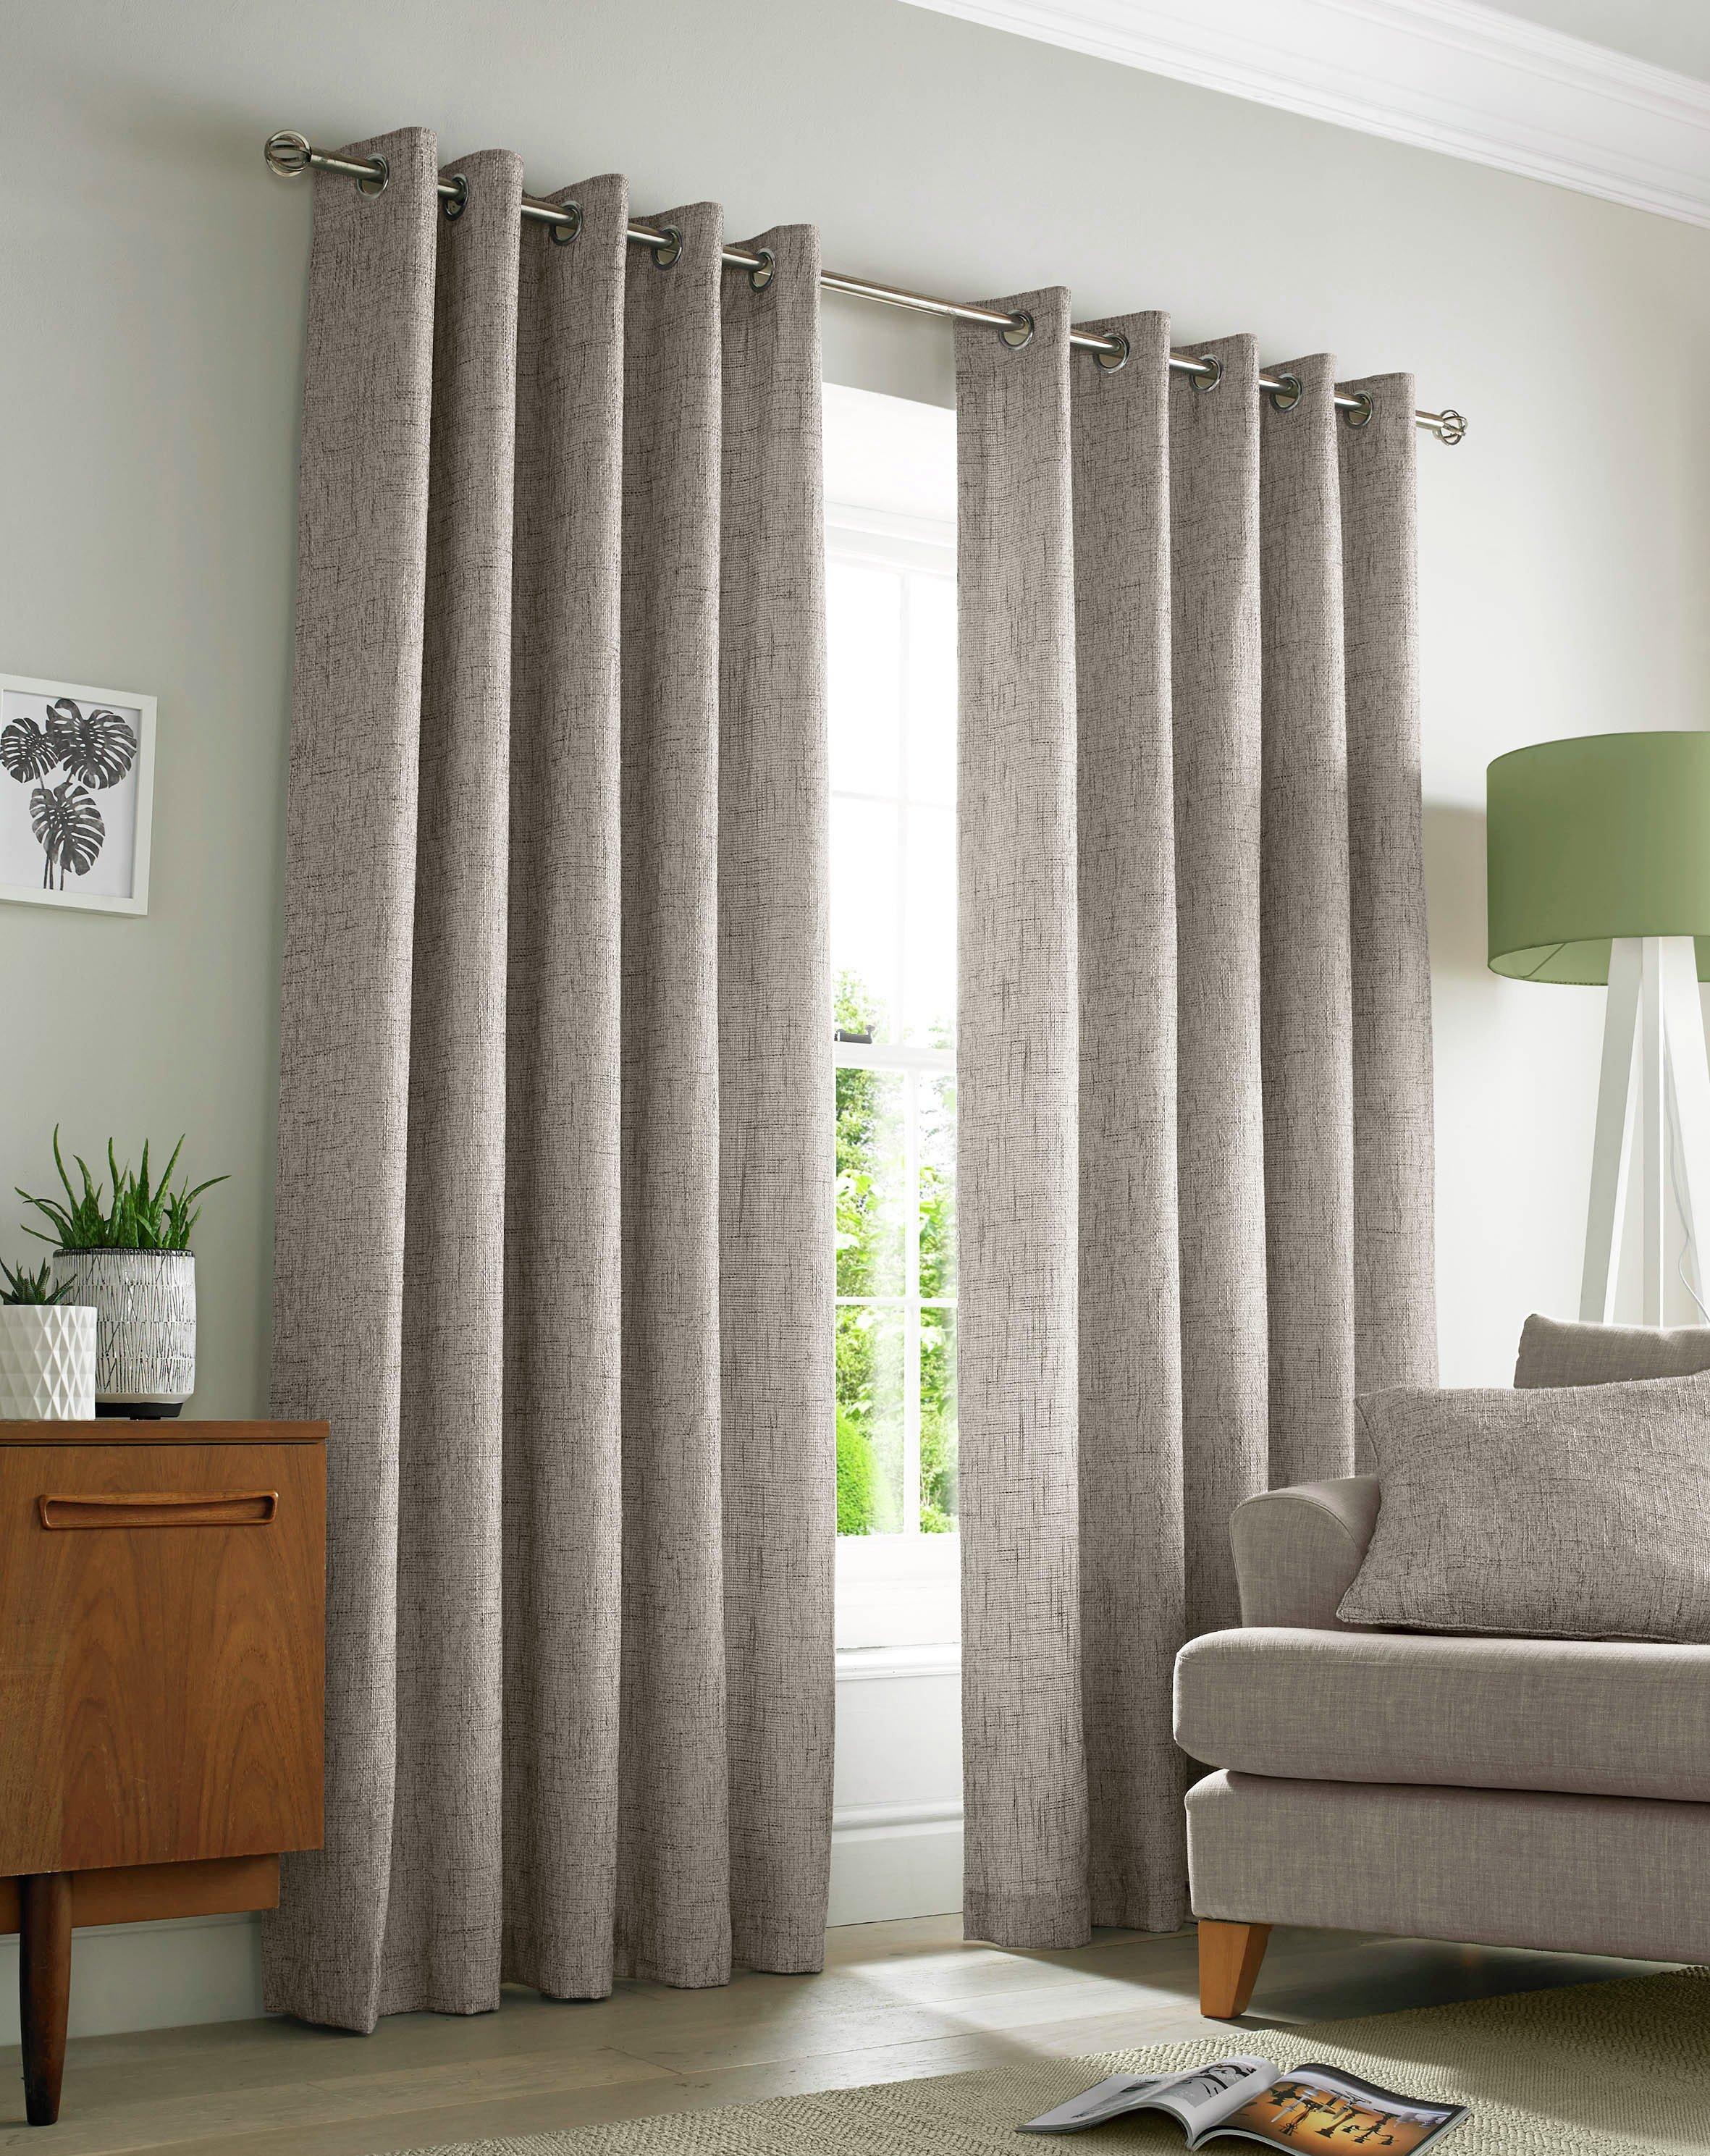 Academy Eyelet Curtains - 165x183cm - Natural.